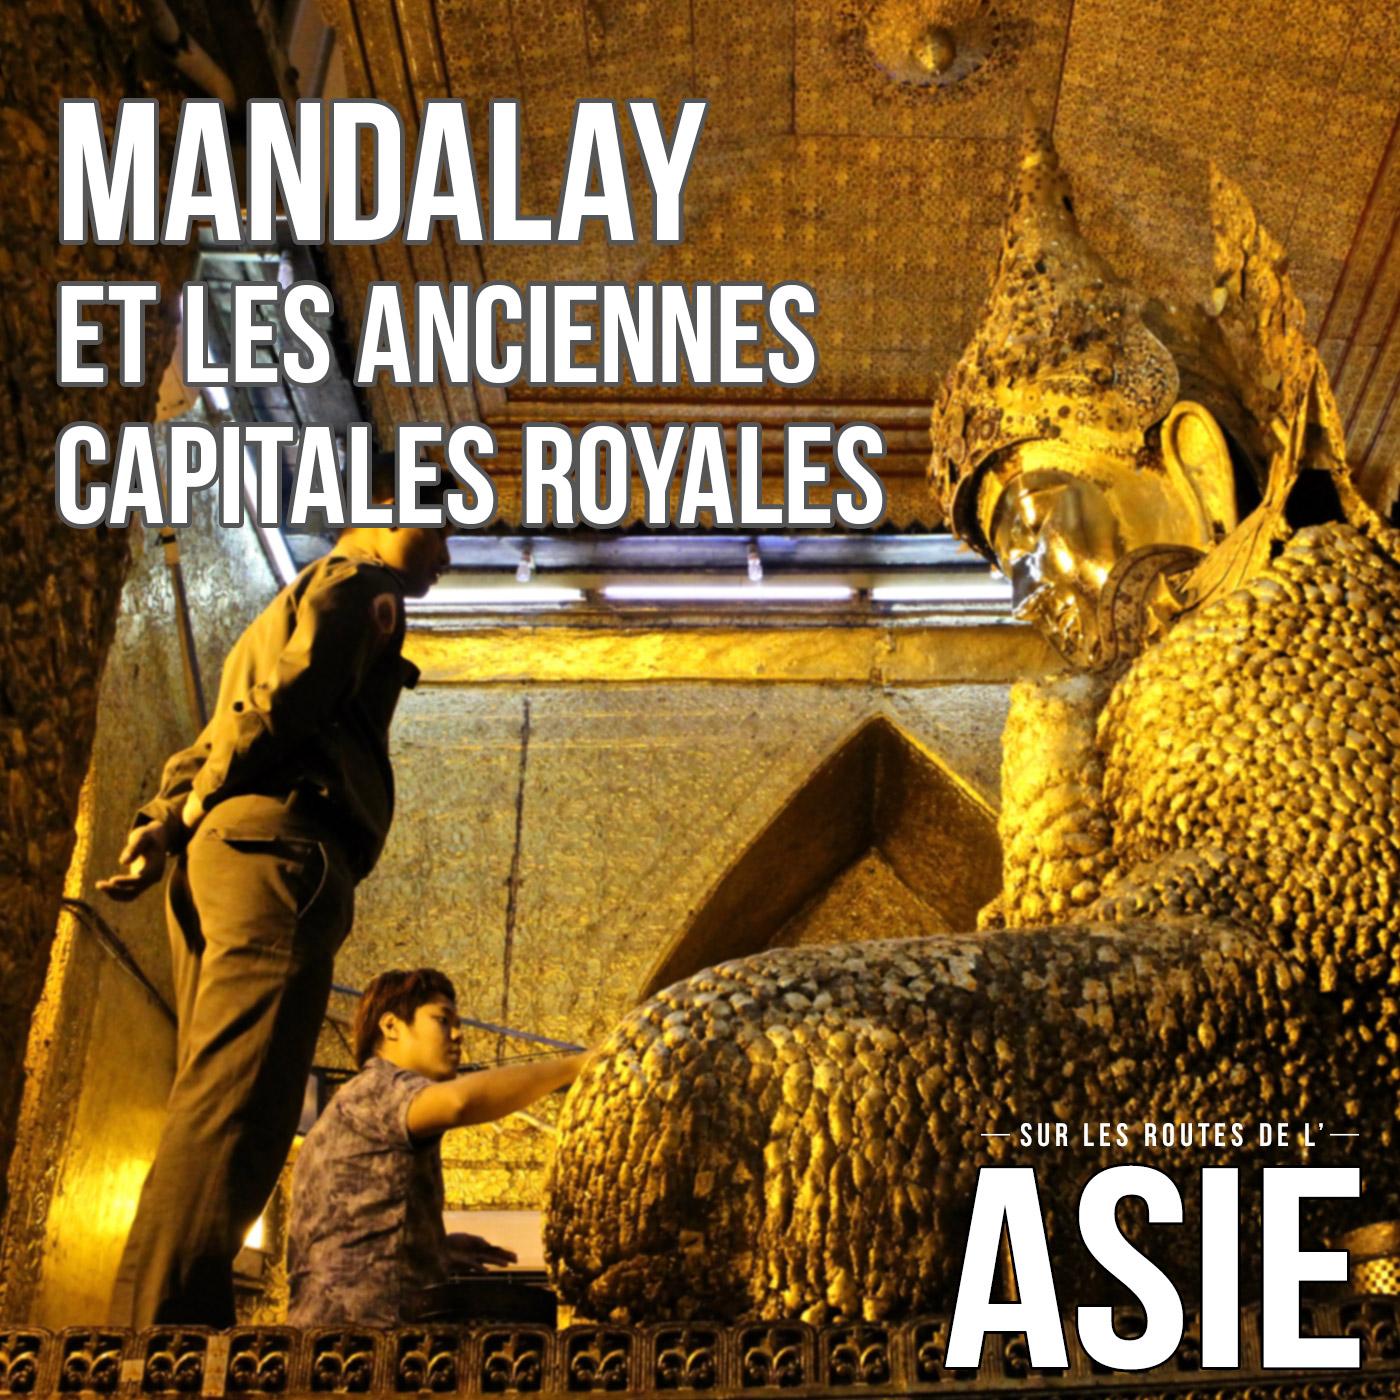 Mandalay et les anciennes capitales royales (Myanmar / Birmanie)